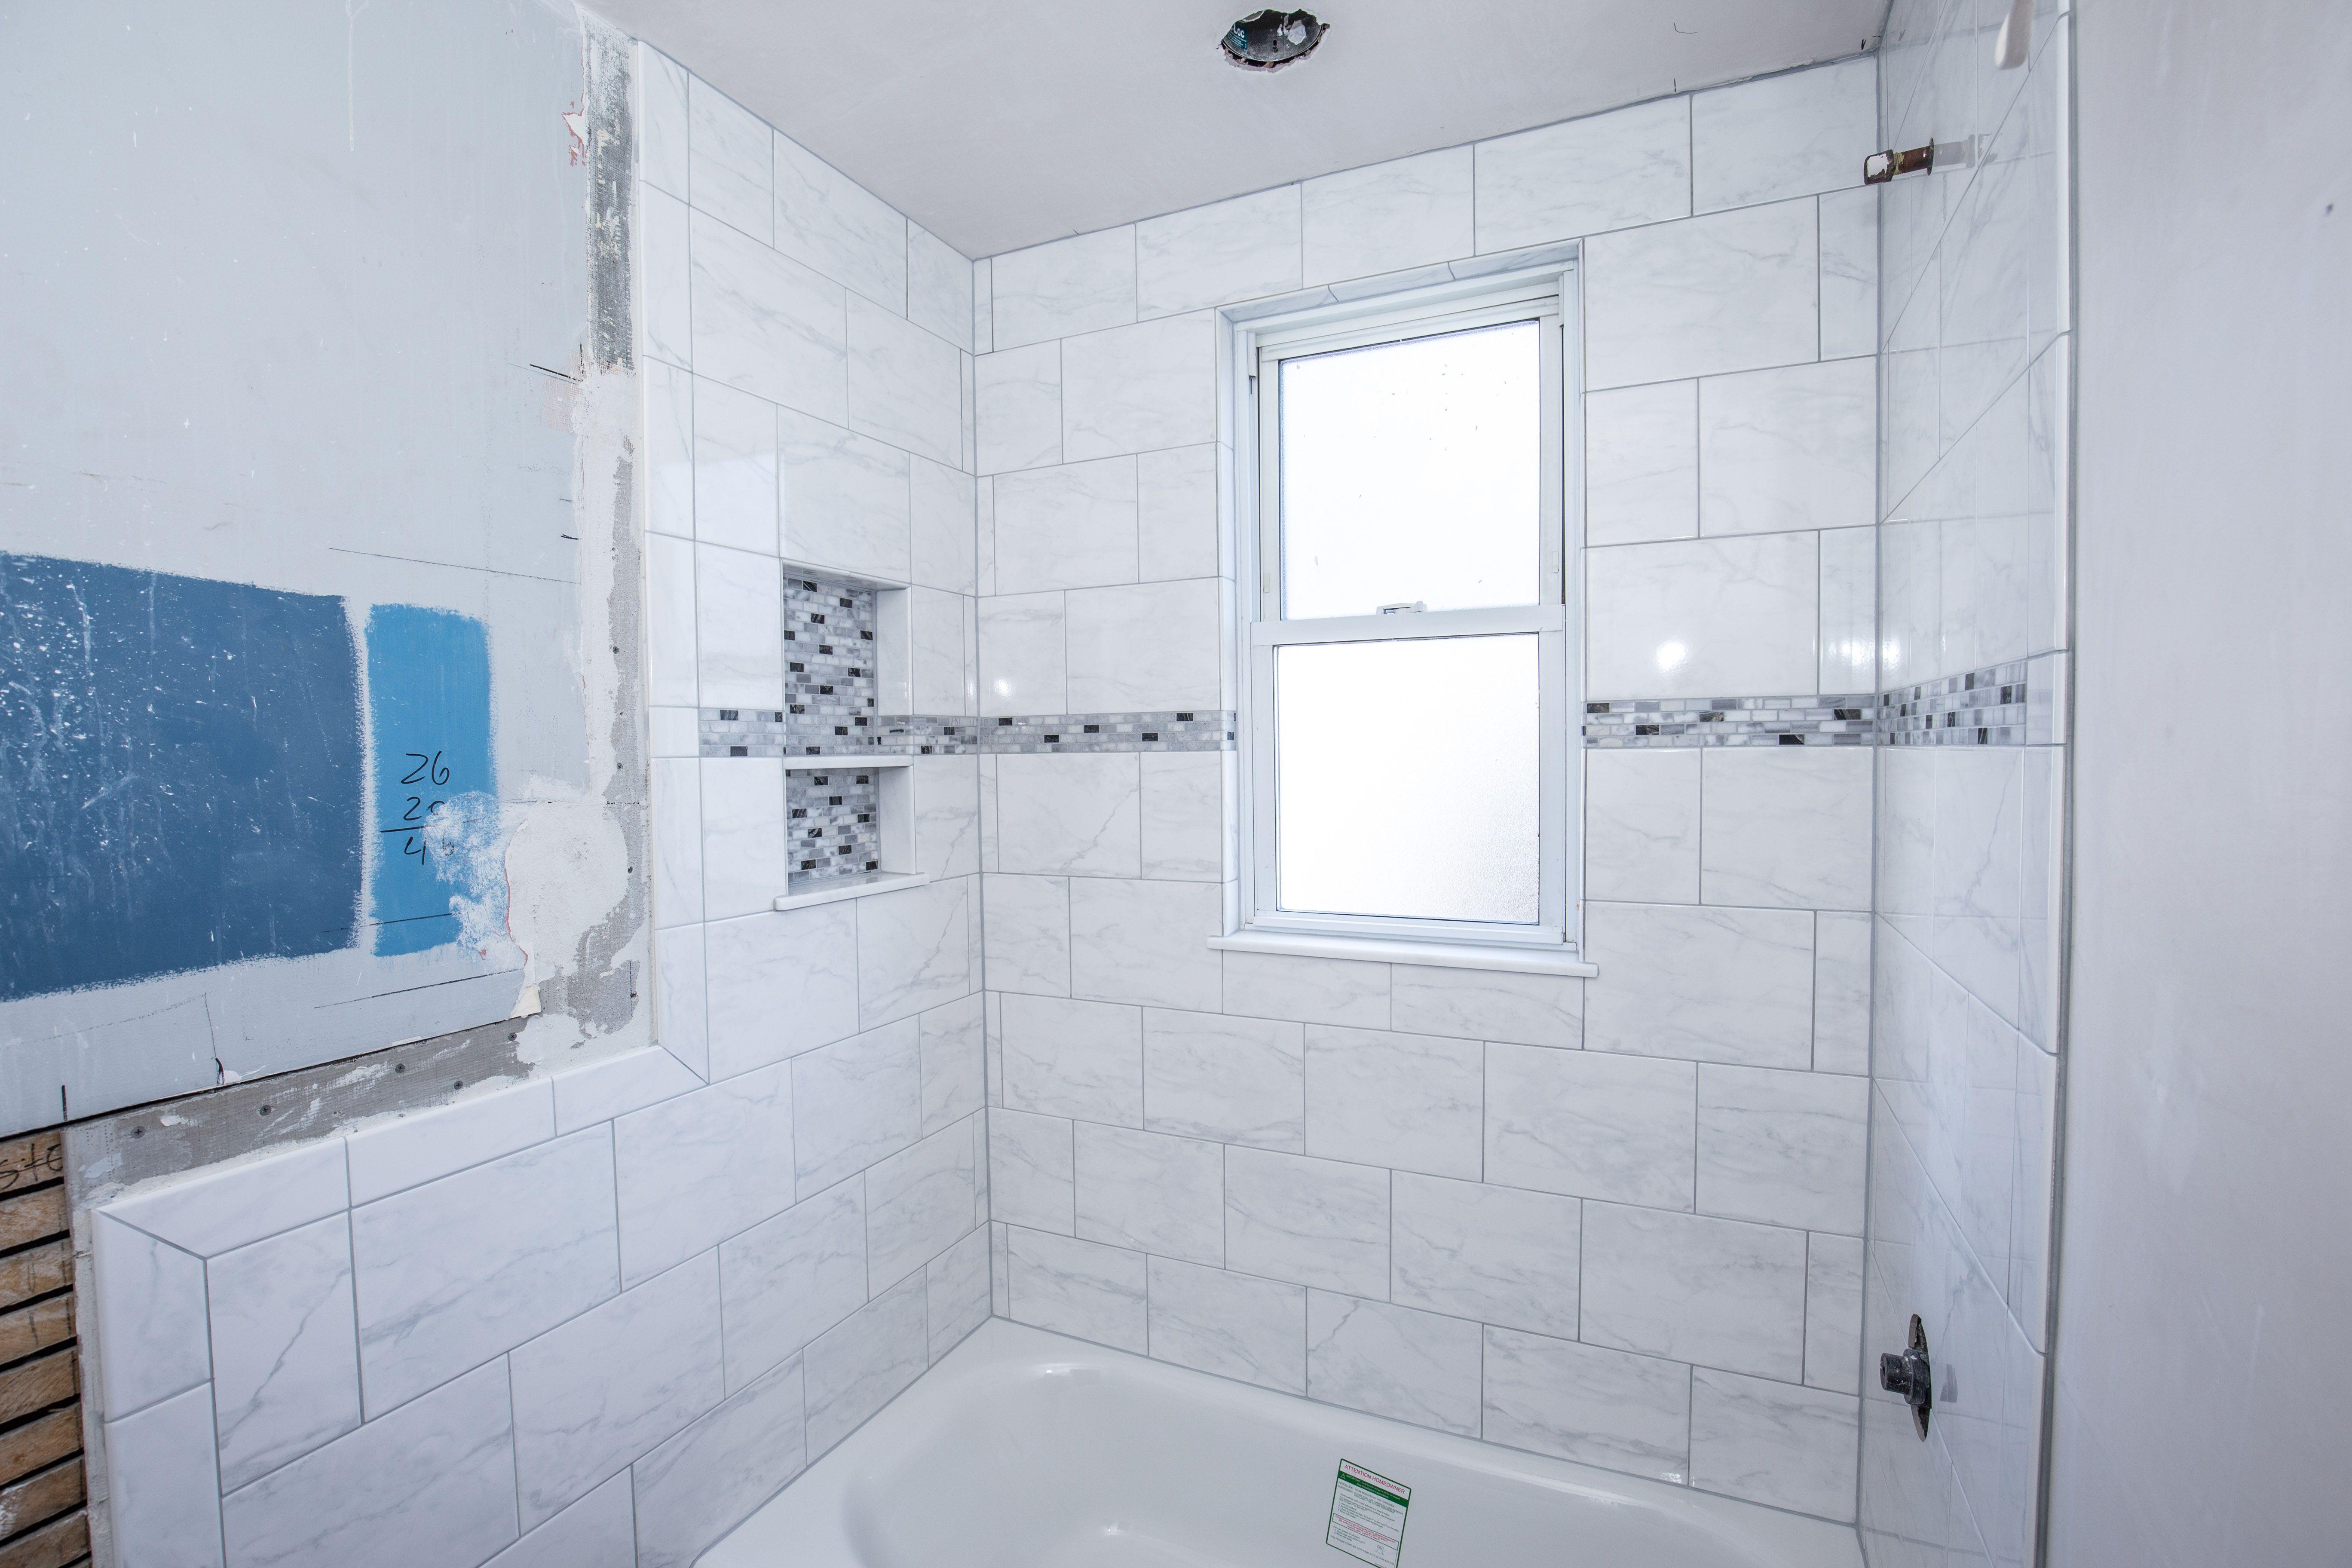 American Olean Mooreland Carrara White Glazed Tile Datile Stone ...